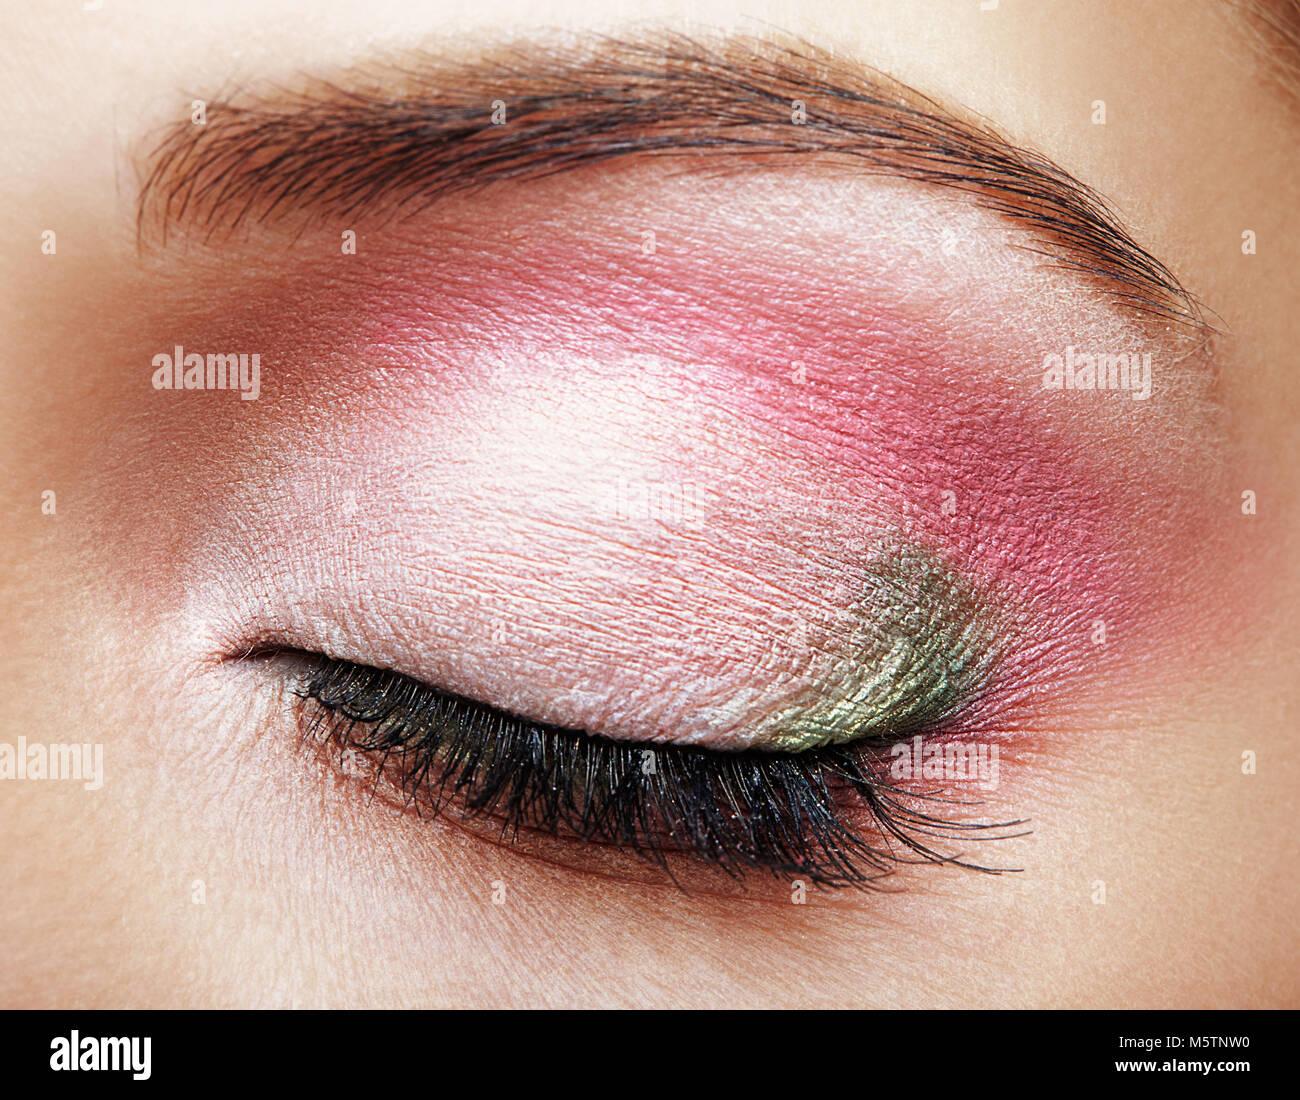 Closeup Macro Shot Of Closed Human Female Eye With Pink And Green